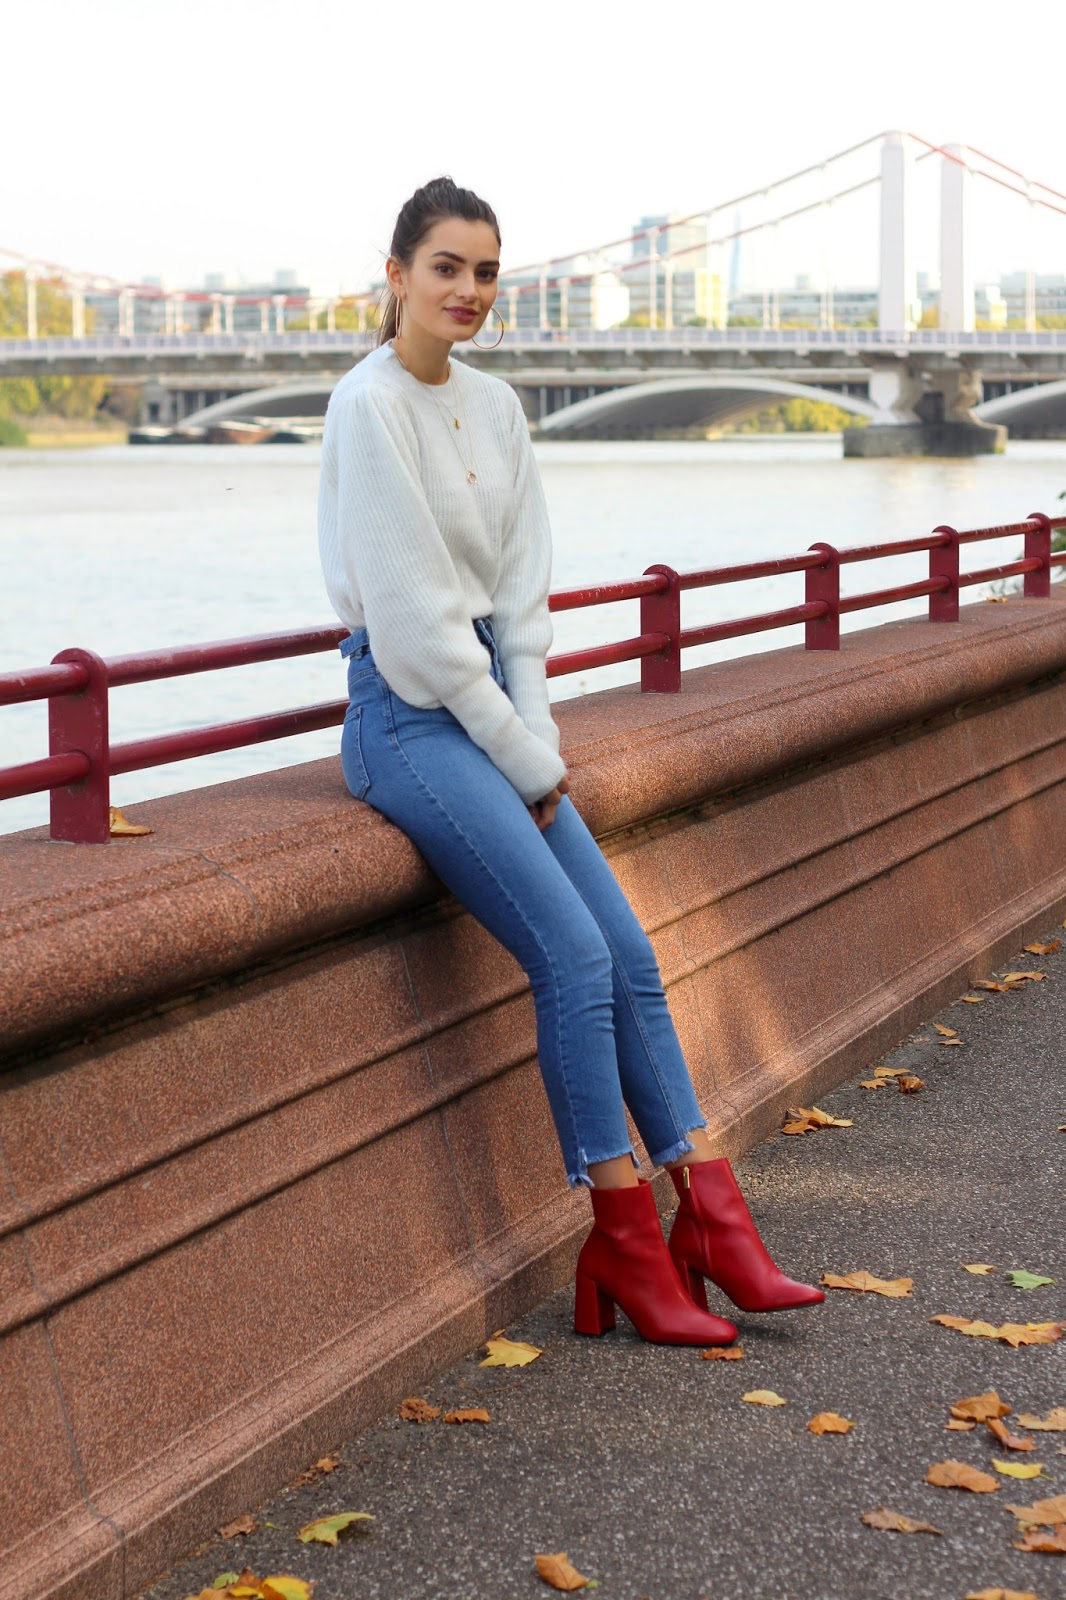 london lifestyle blog peexo